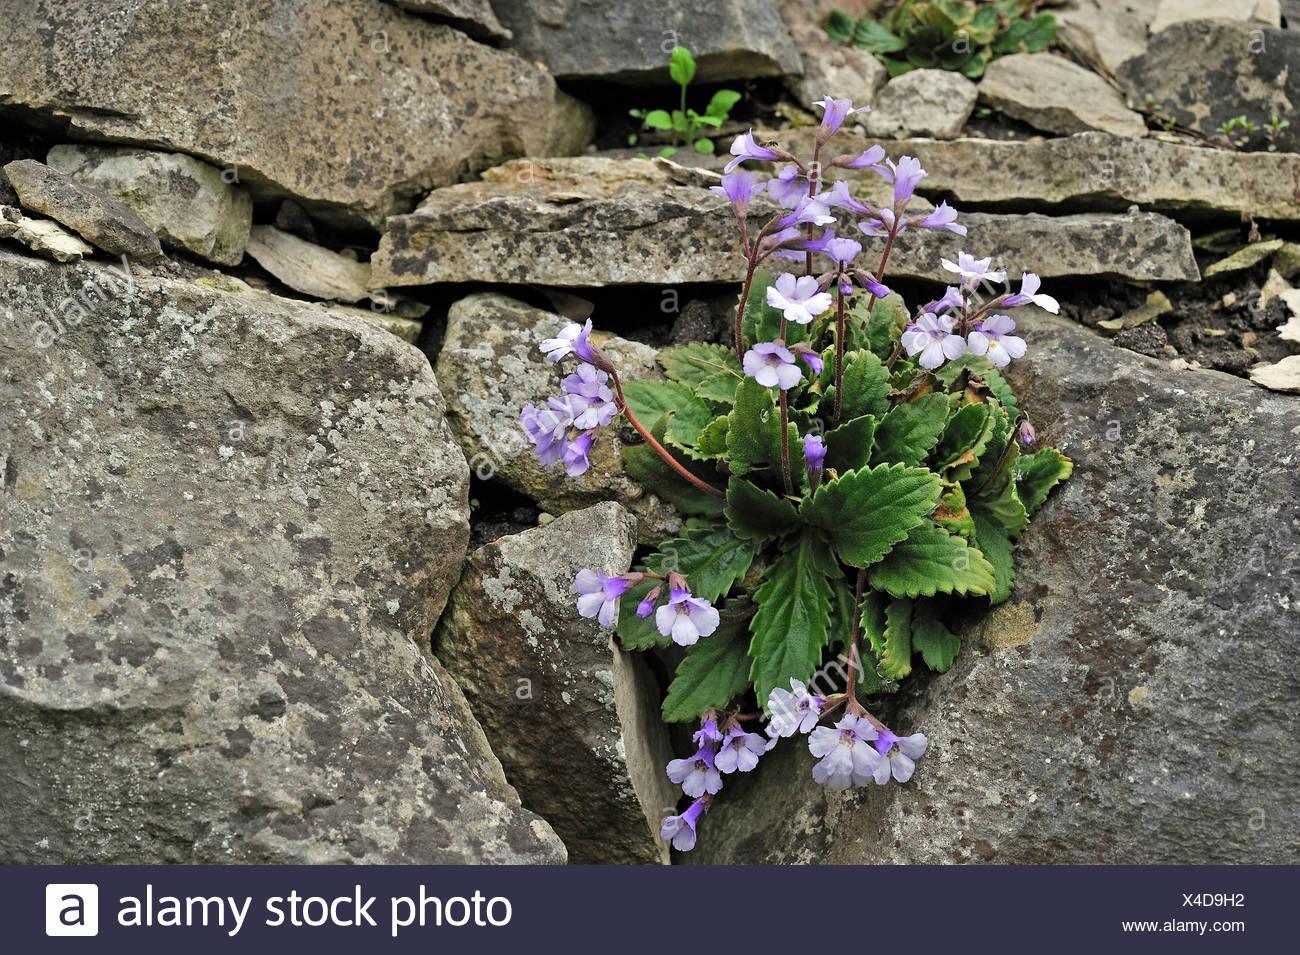 Wallflower (Haberlea Rhodopensis), the Balkans - Stock Image